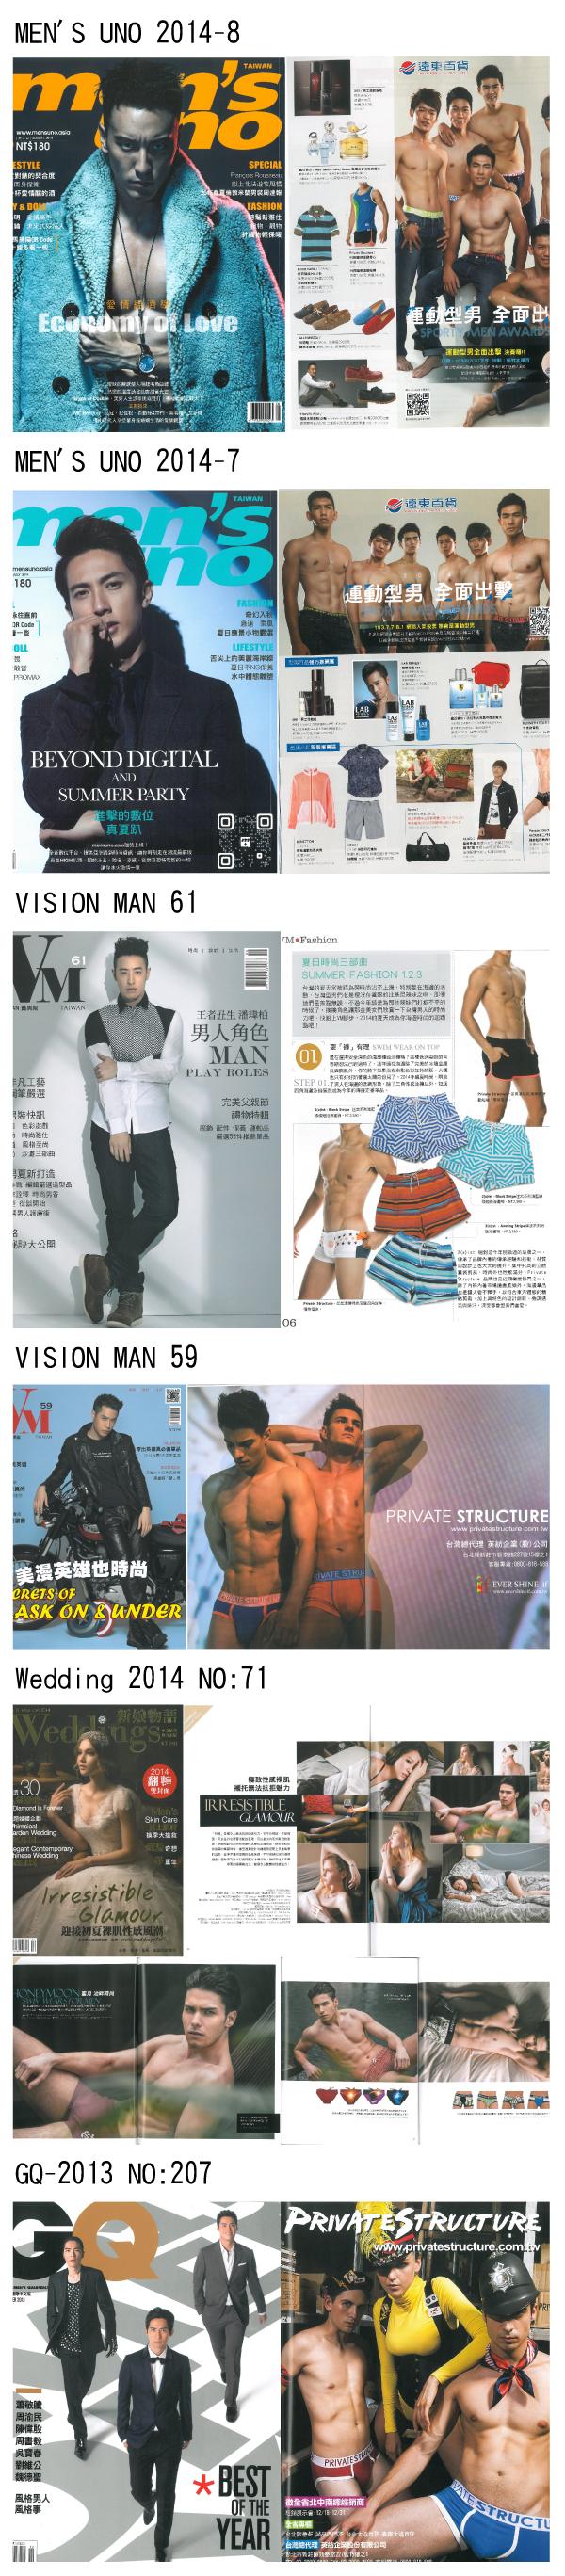 http://www.momoshop.com.tw/expertimg/0003/737/826/ps-magazine.jpg?t=1448902235